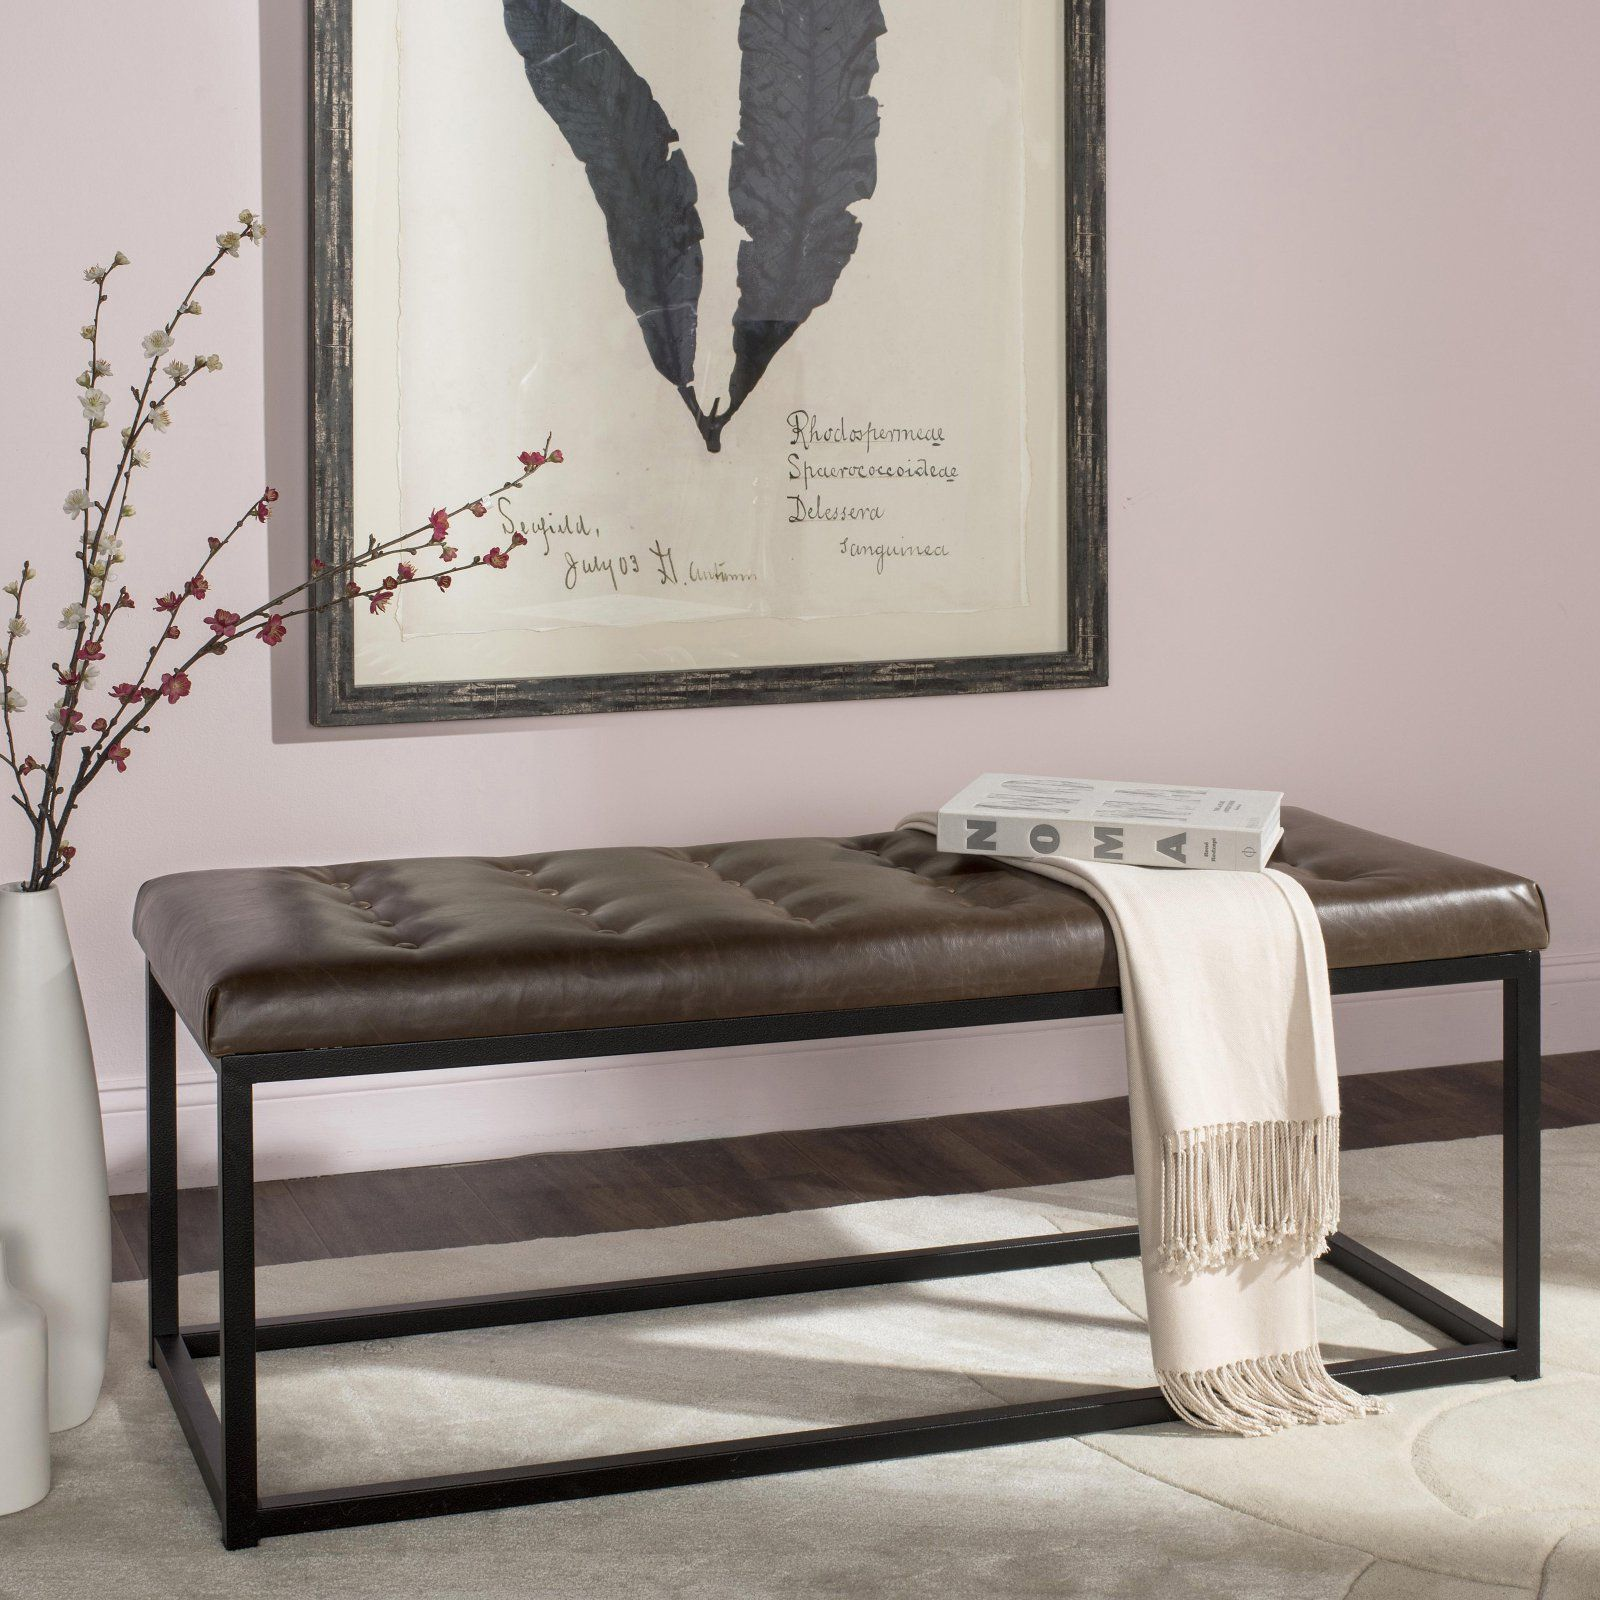 Super Safavieh Reynolds Faux Leather Bench In 2019 Products Inzonedesignstudio Interior Chair Design Inzonedesignstudiocom